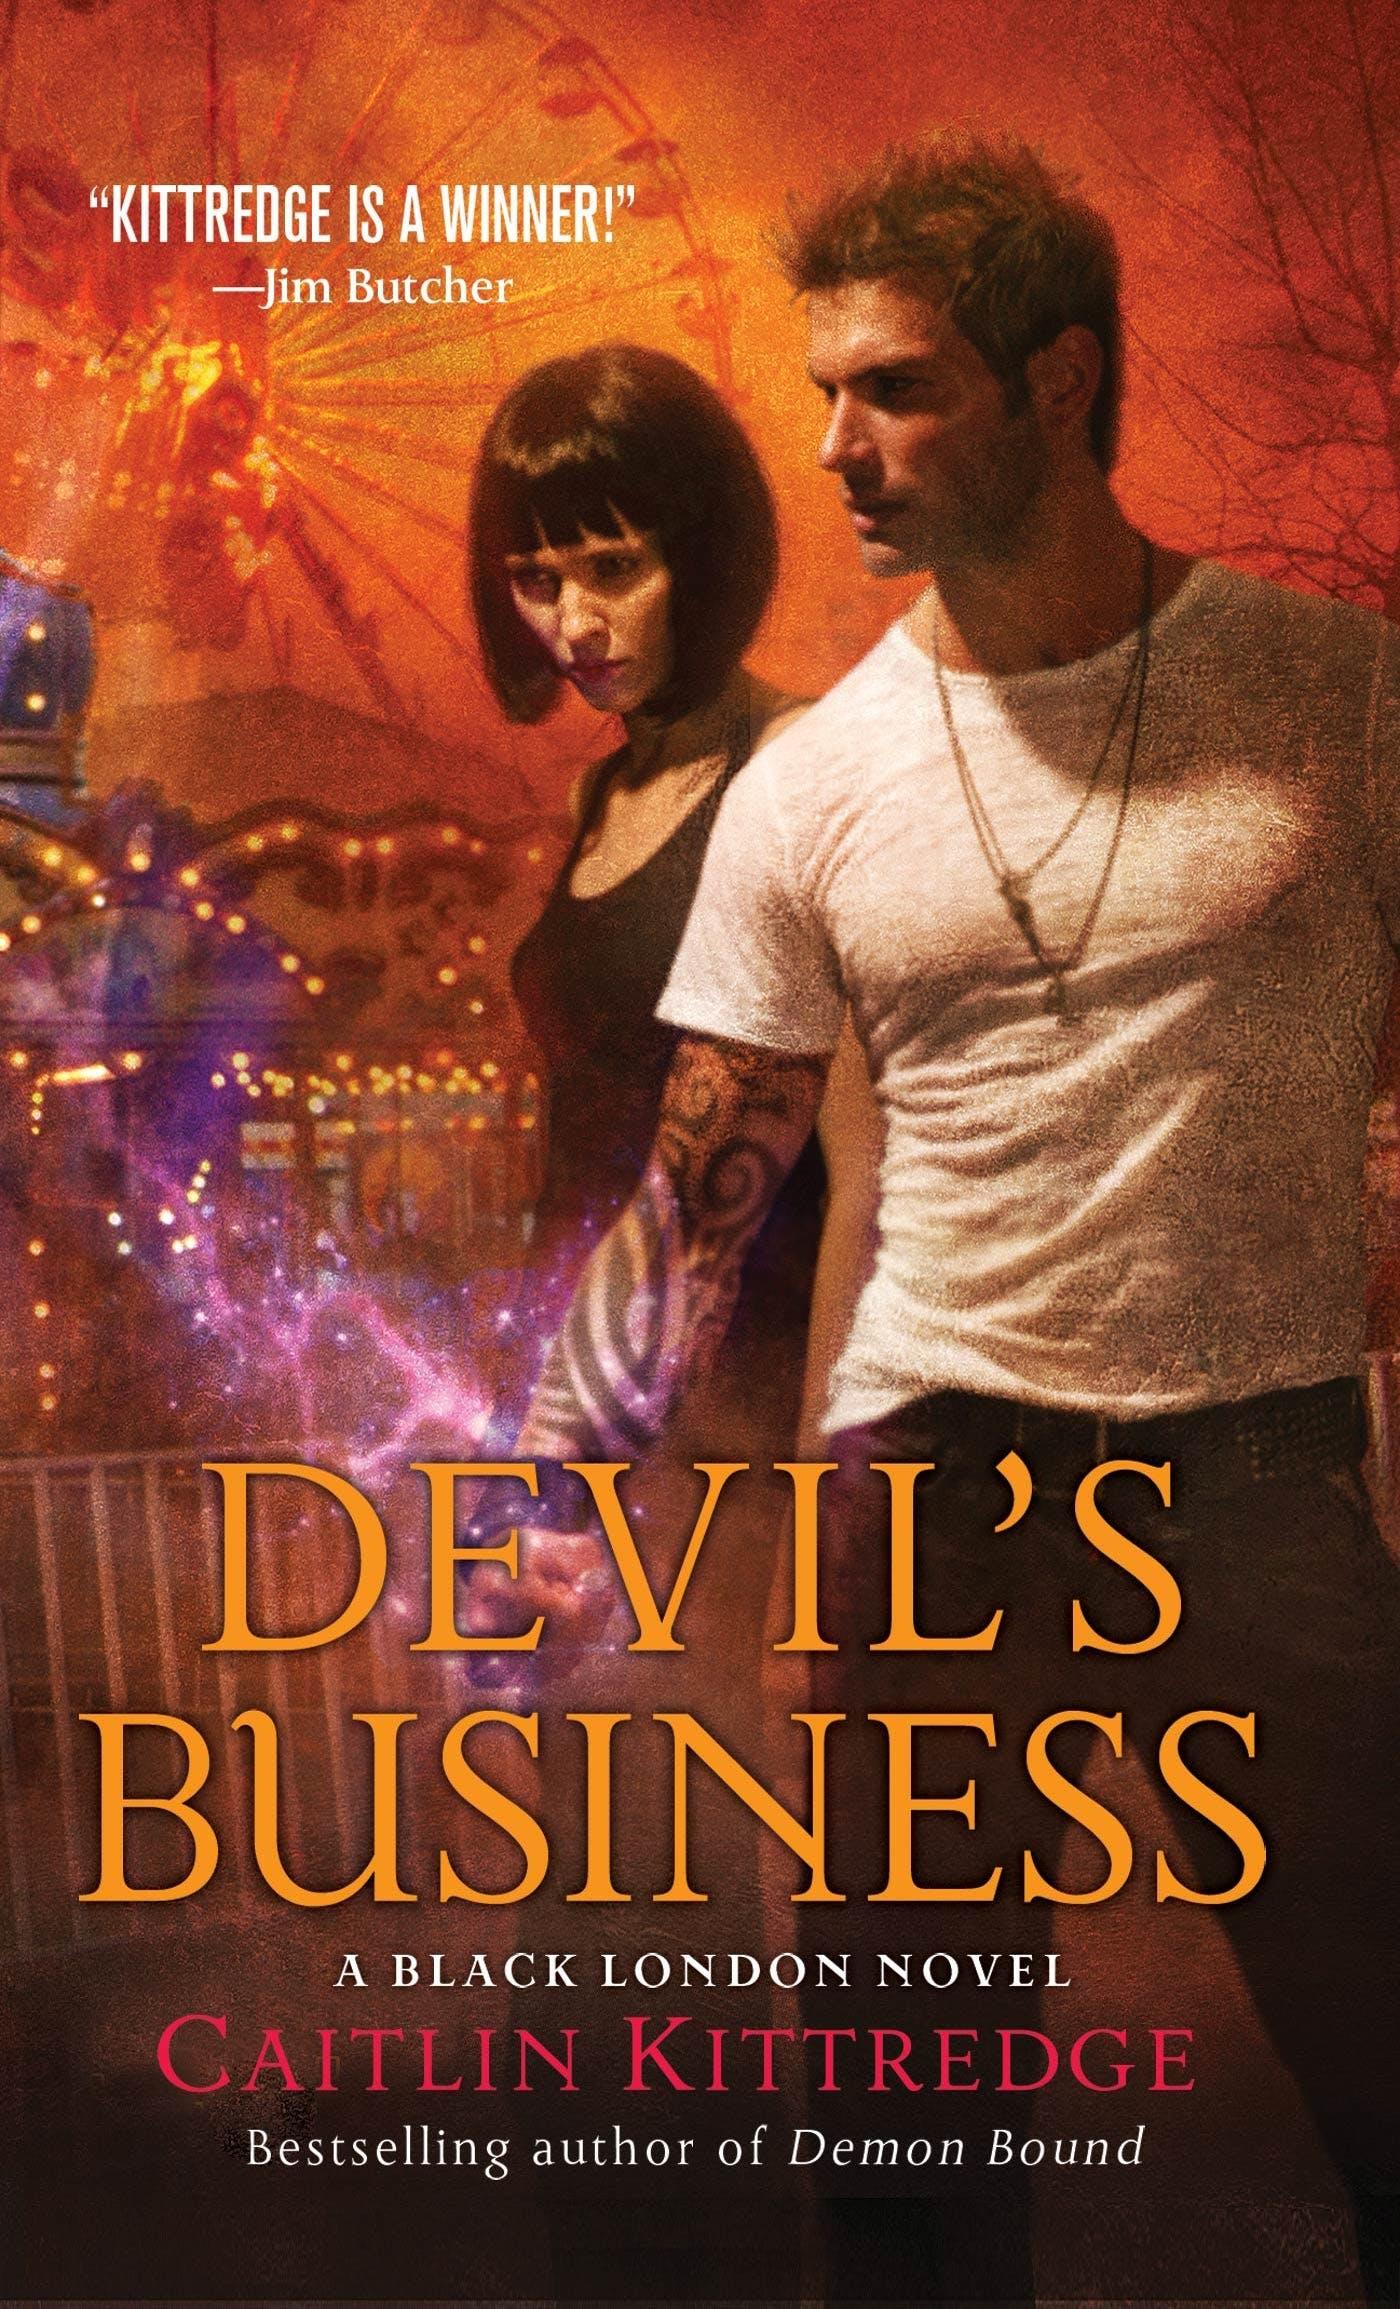 Image of Devil's Business